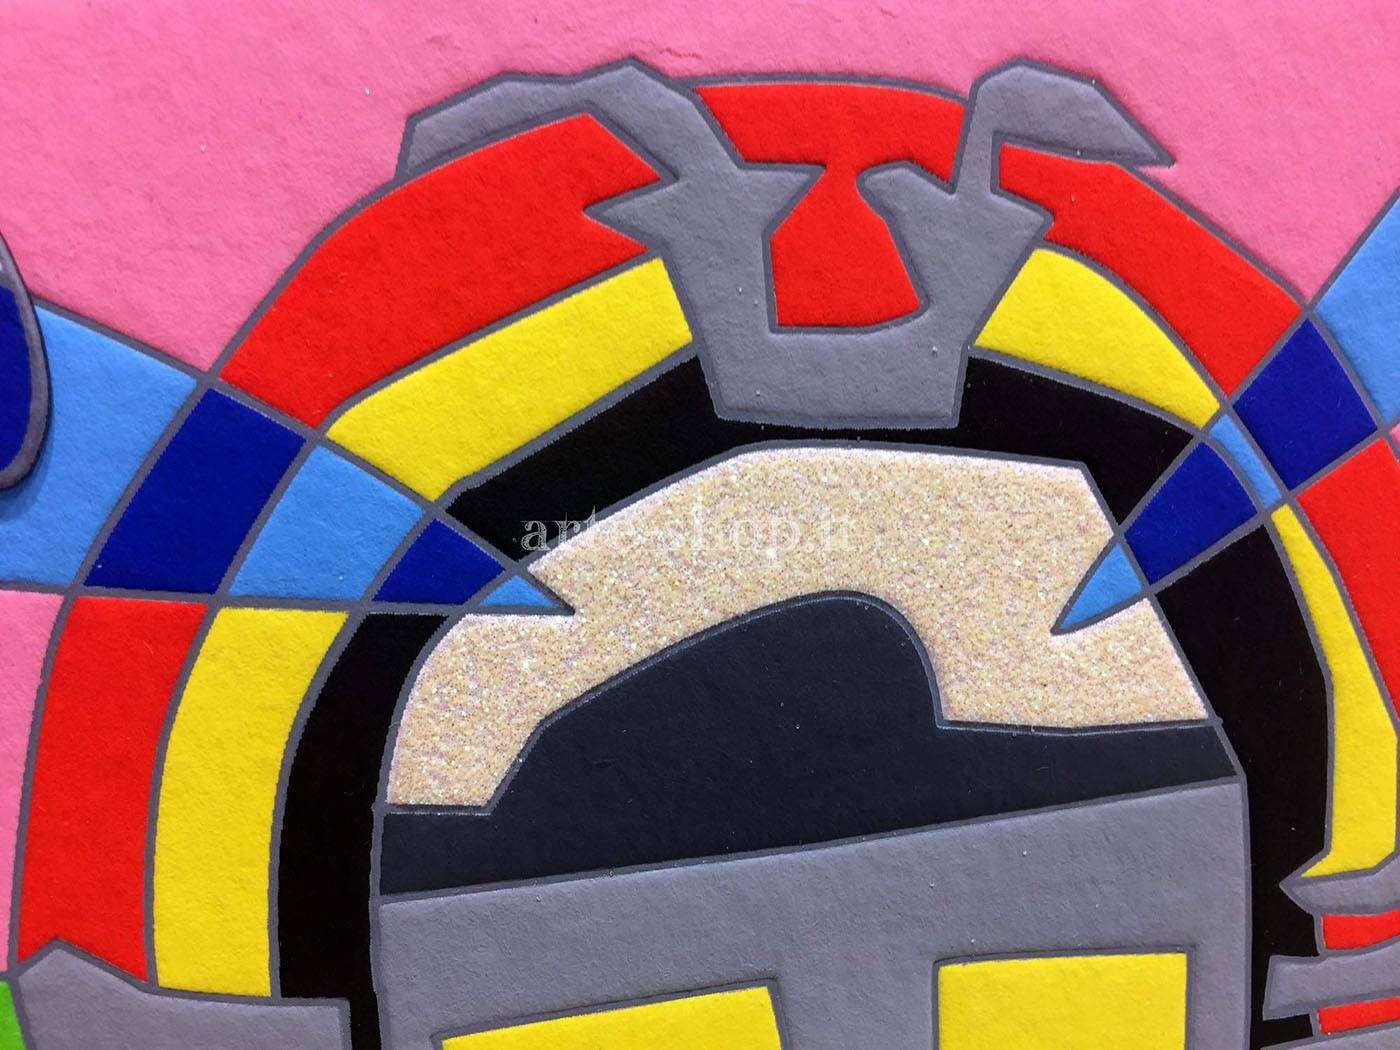 arte pentagono shop dettaglio numero 249